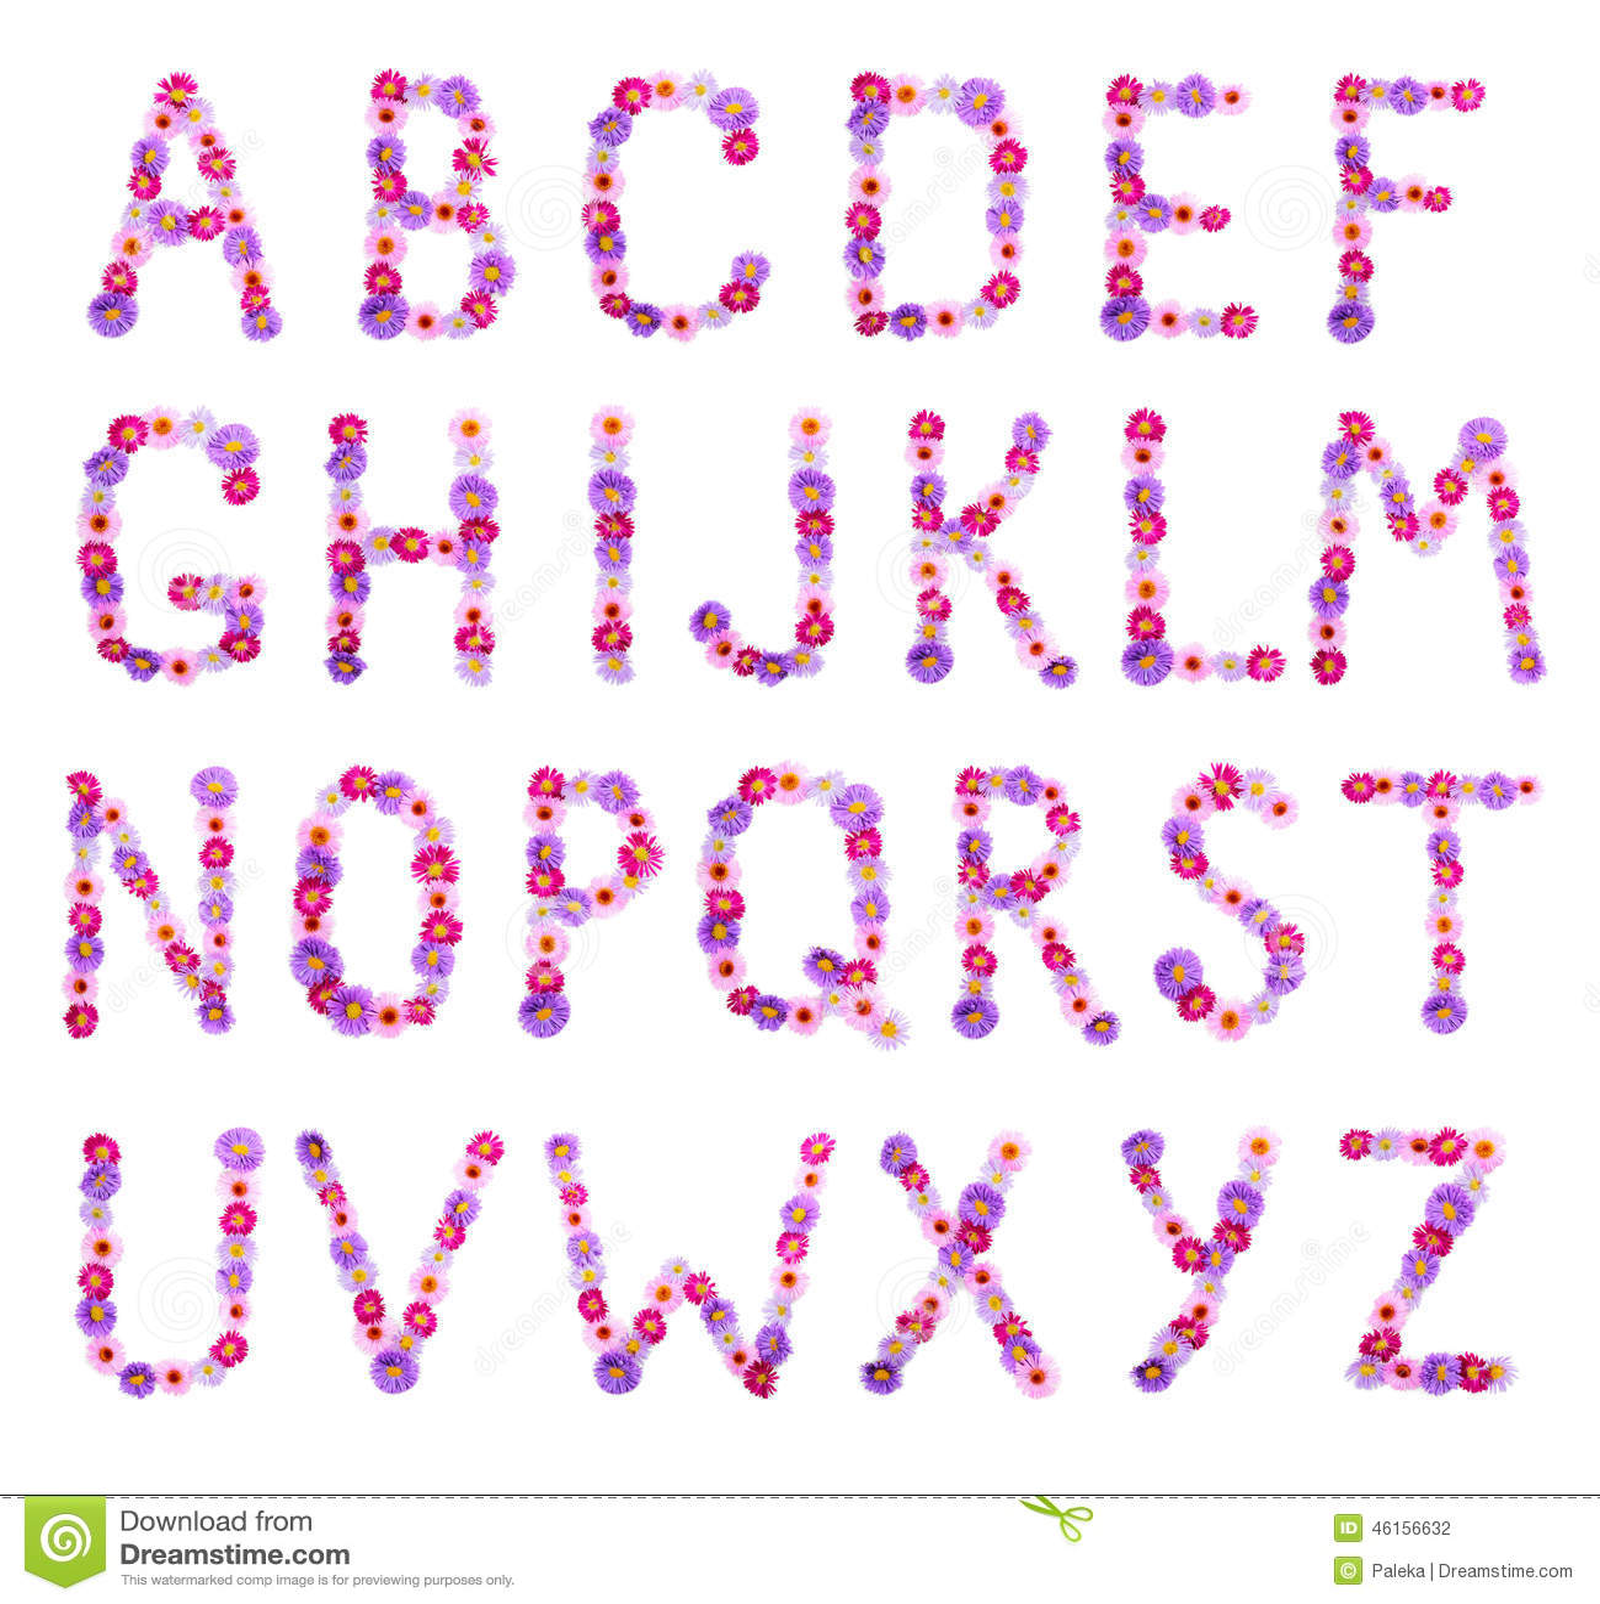 Flower alphabet stock photo. Image of font, image, color - 46156632